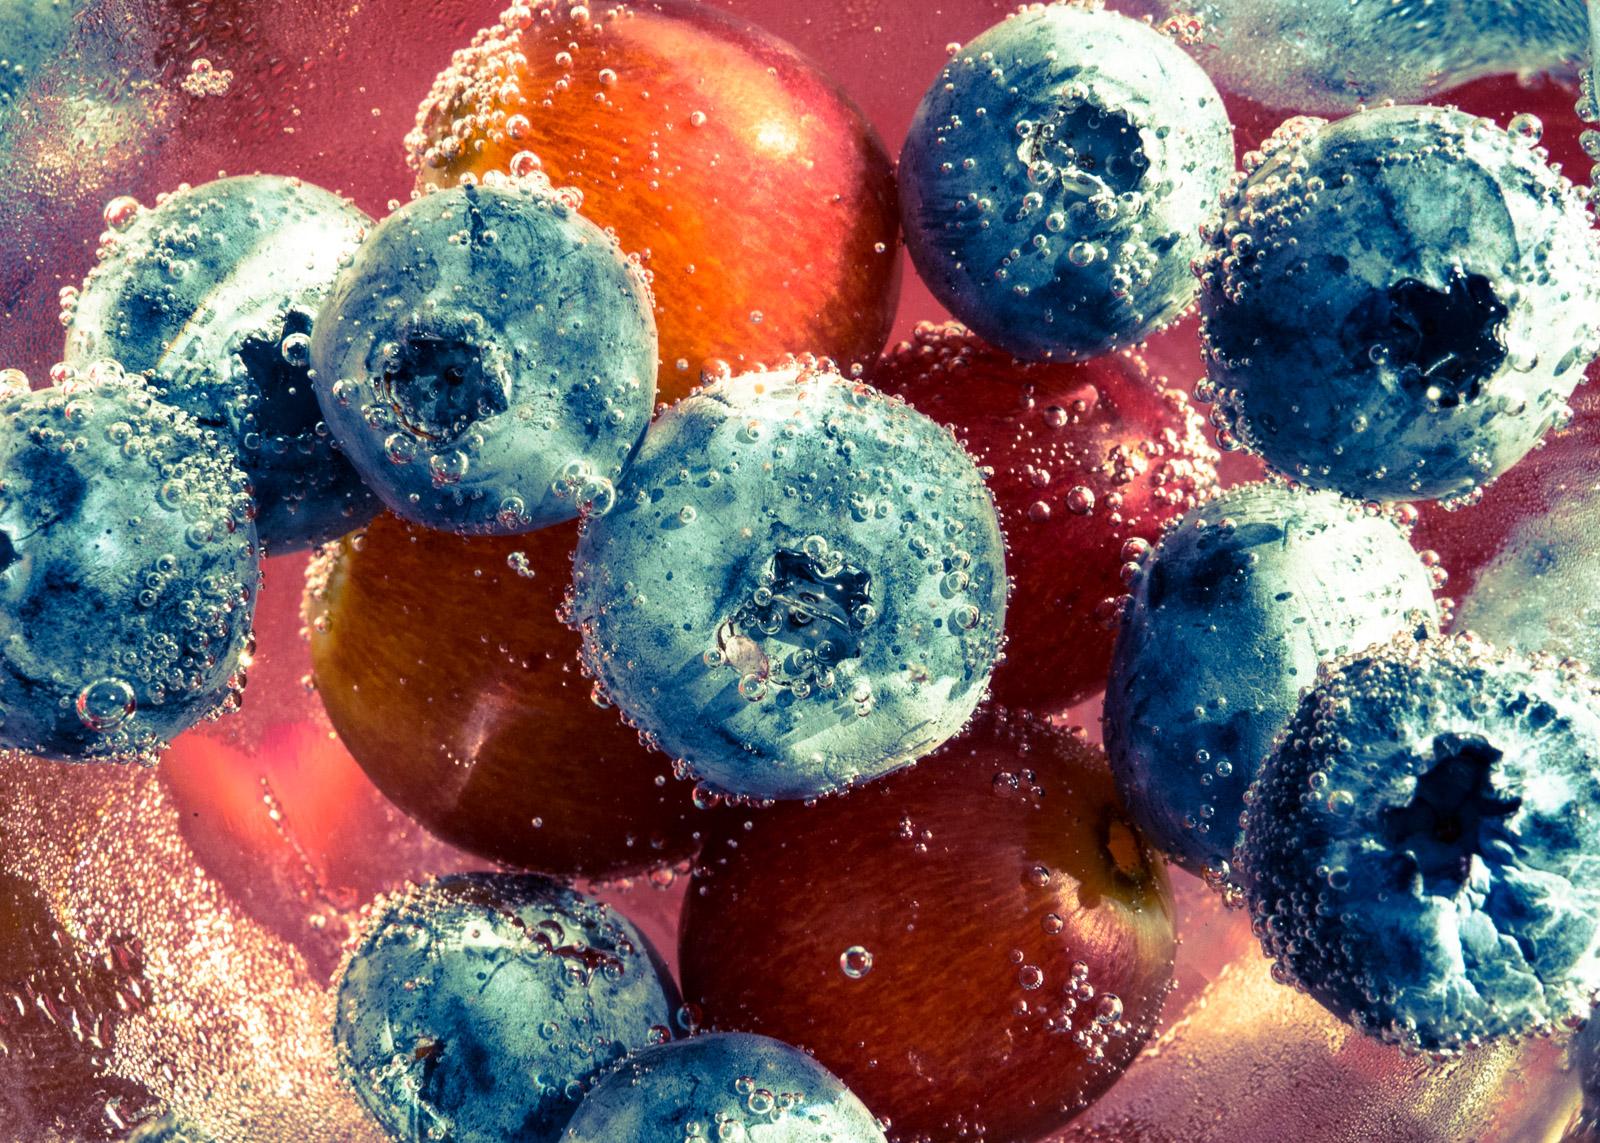 Larry Gold, Fruit